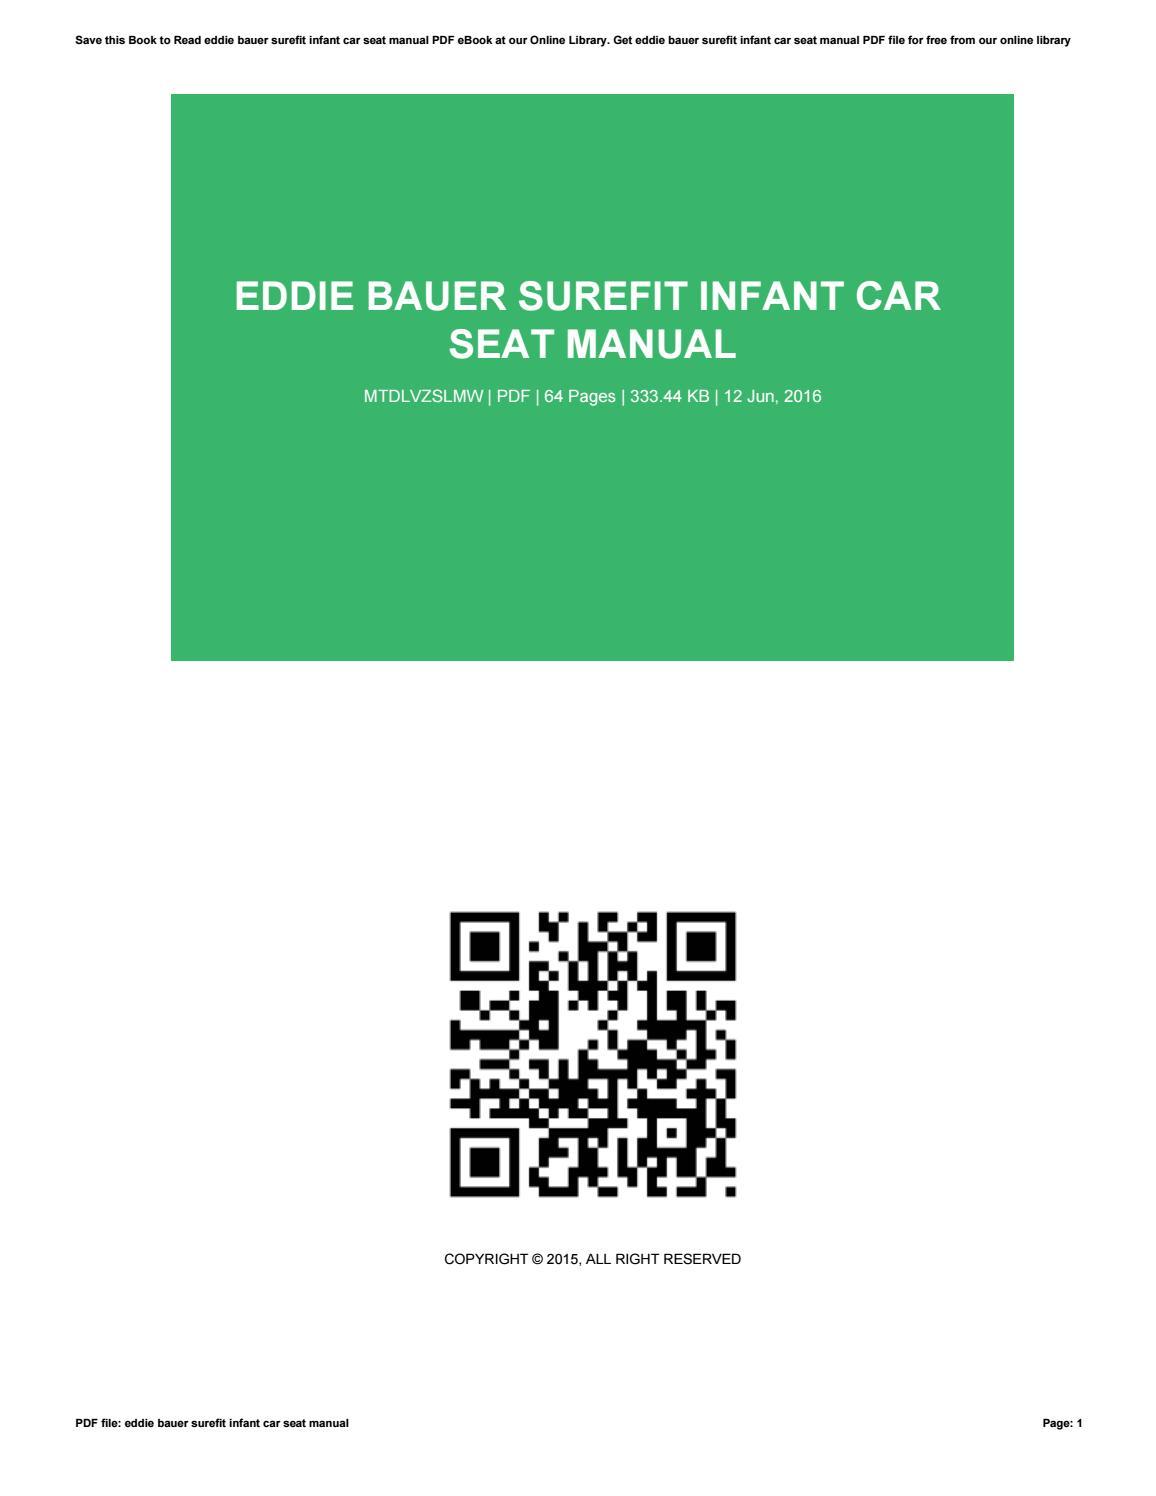 Eddie Bauer Surefit Infant Car Seat Manual By KathleenScott3335